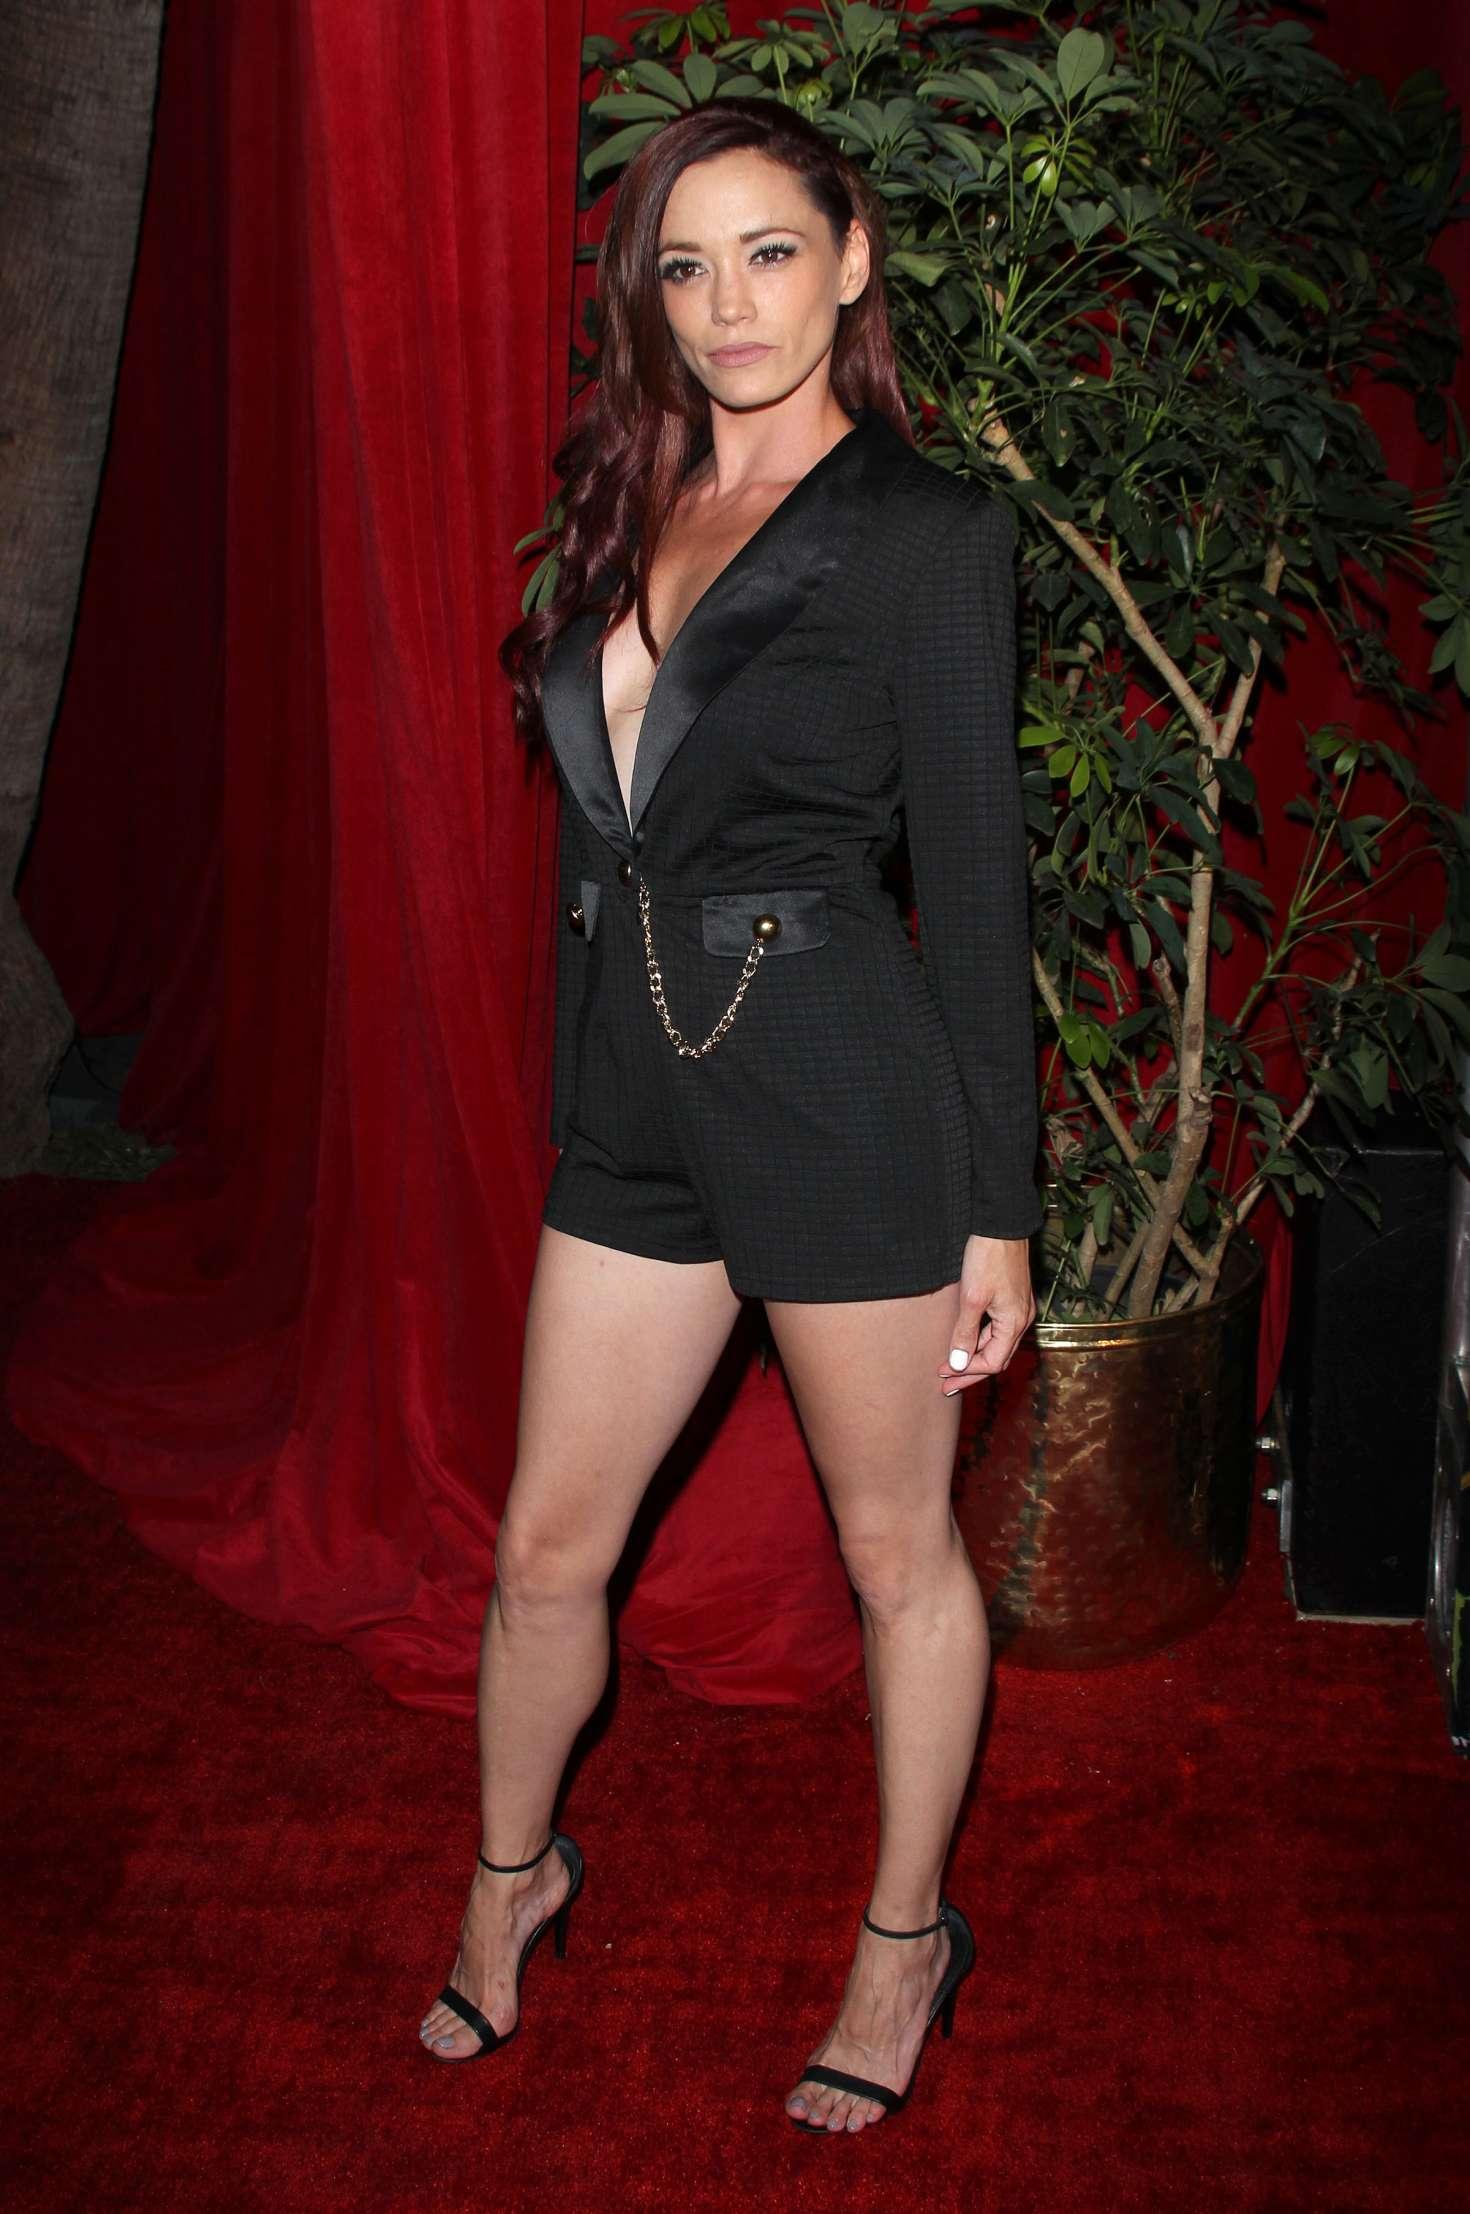 Jessica Sutta - 2016 Maxim Hot 100 Party in Los Angeles